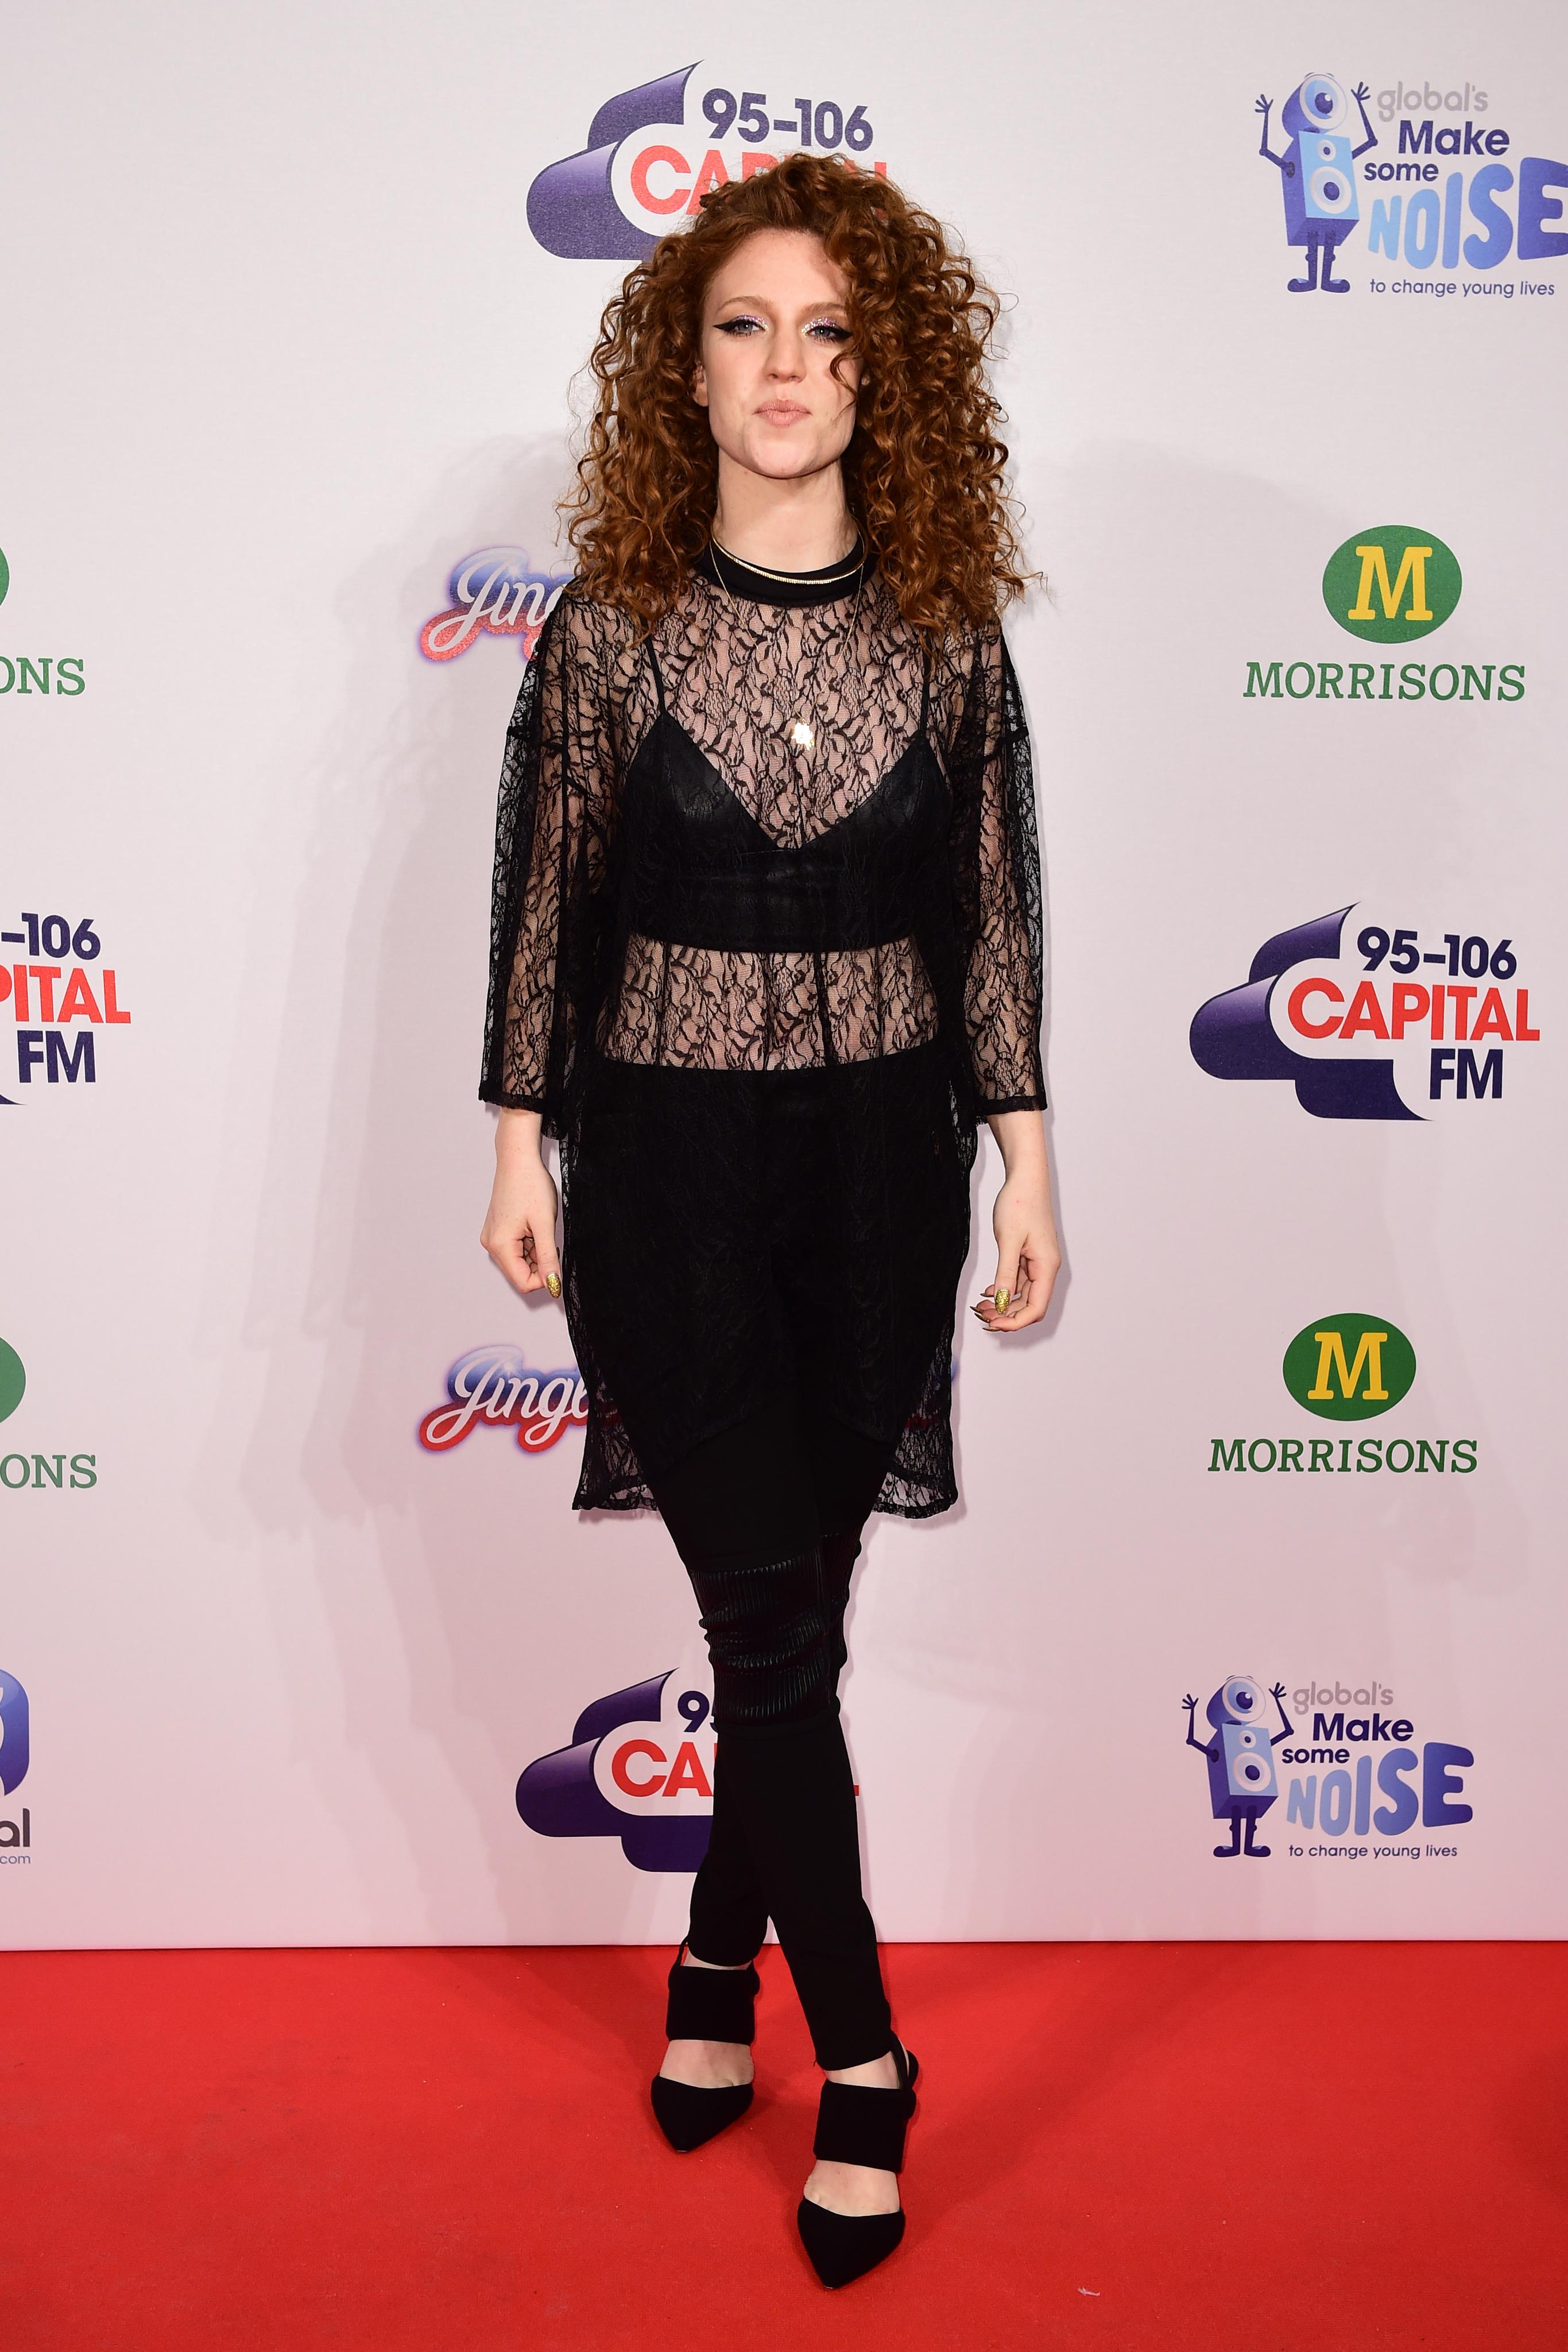 Jess Glynne Red Carpet Jingle Bell Ball 2014